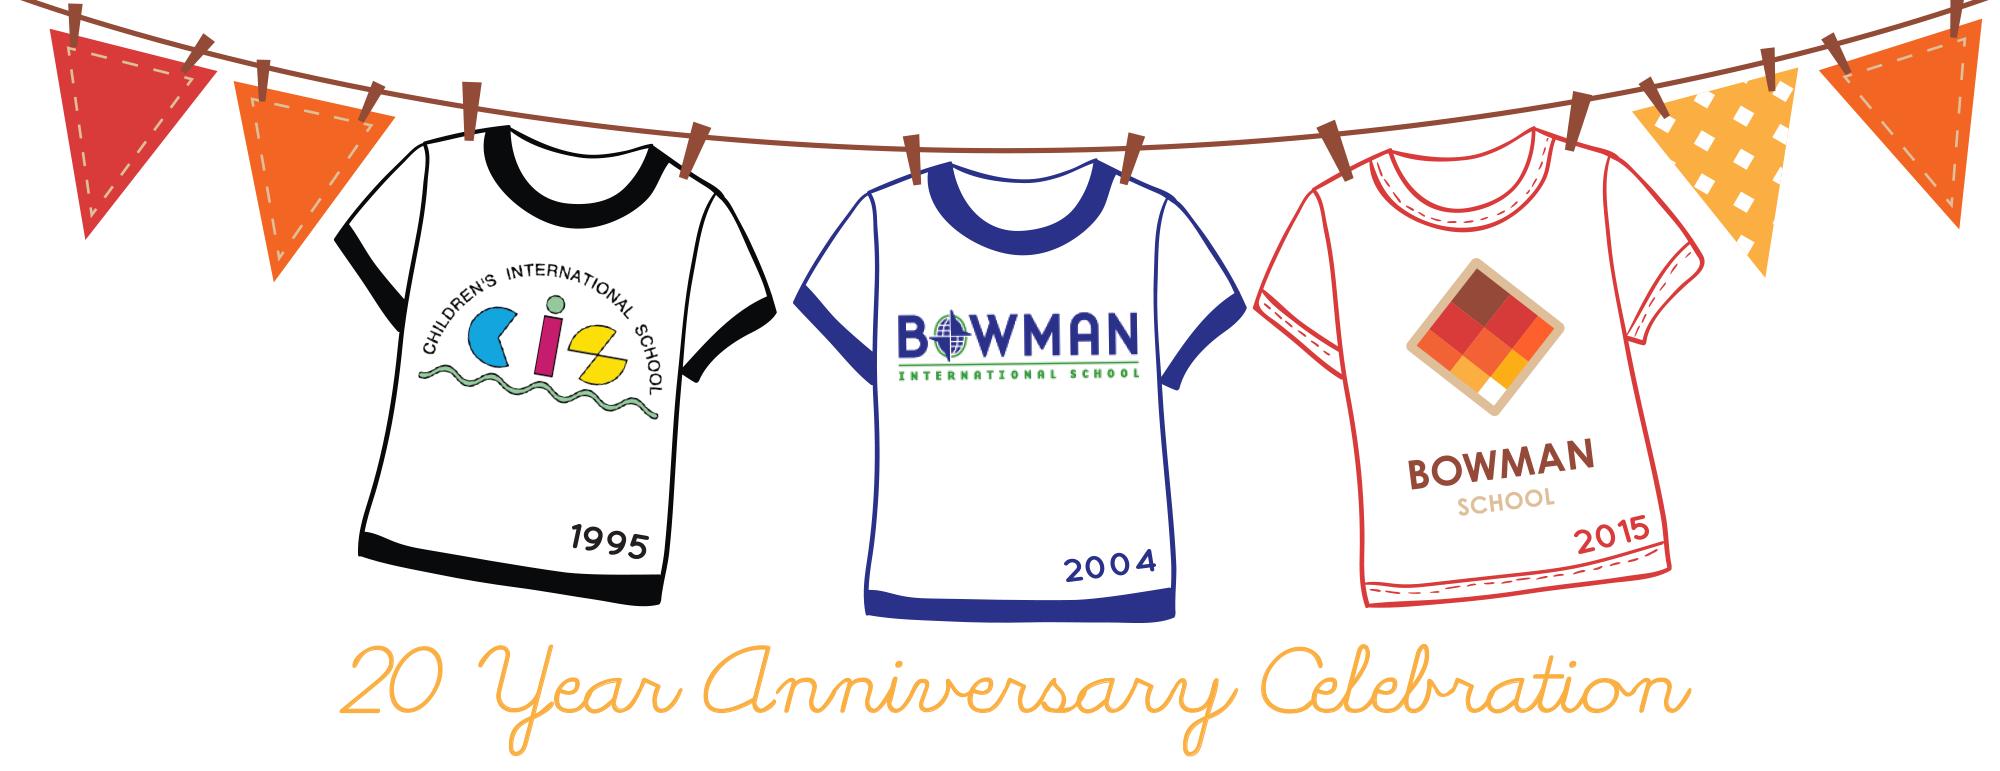 Bowman-BannerX2